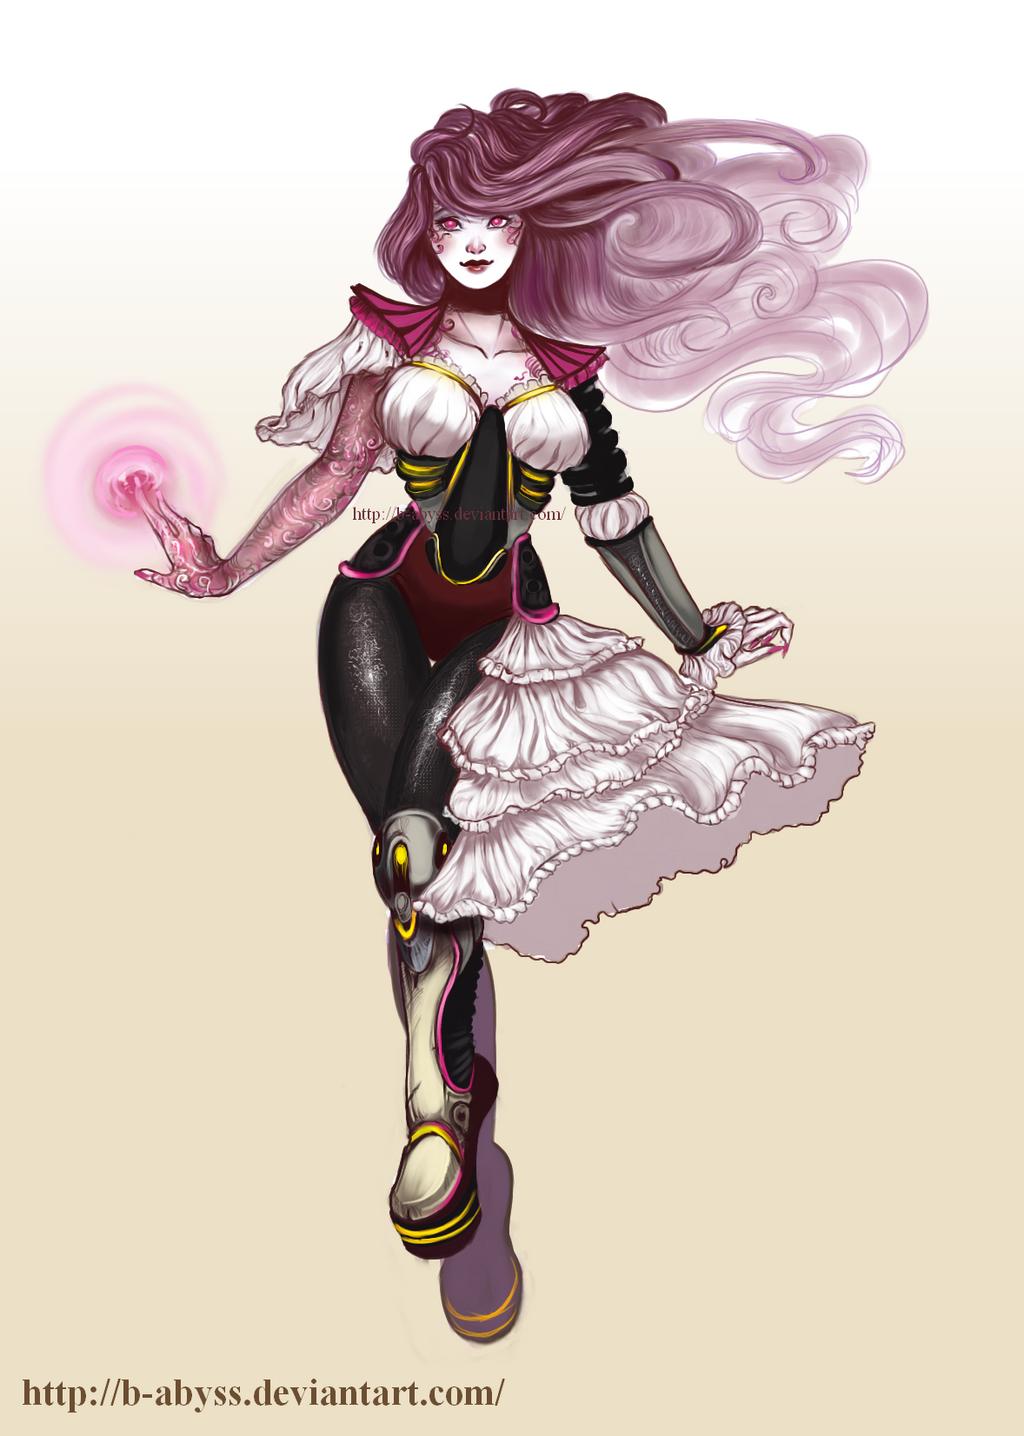 Concept - Nebula by B-Abyss